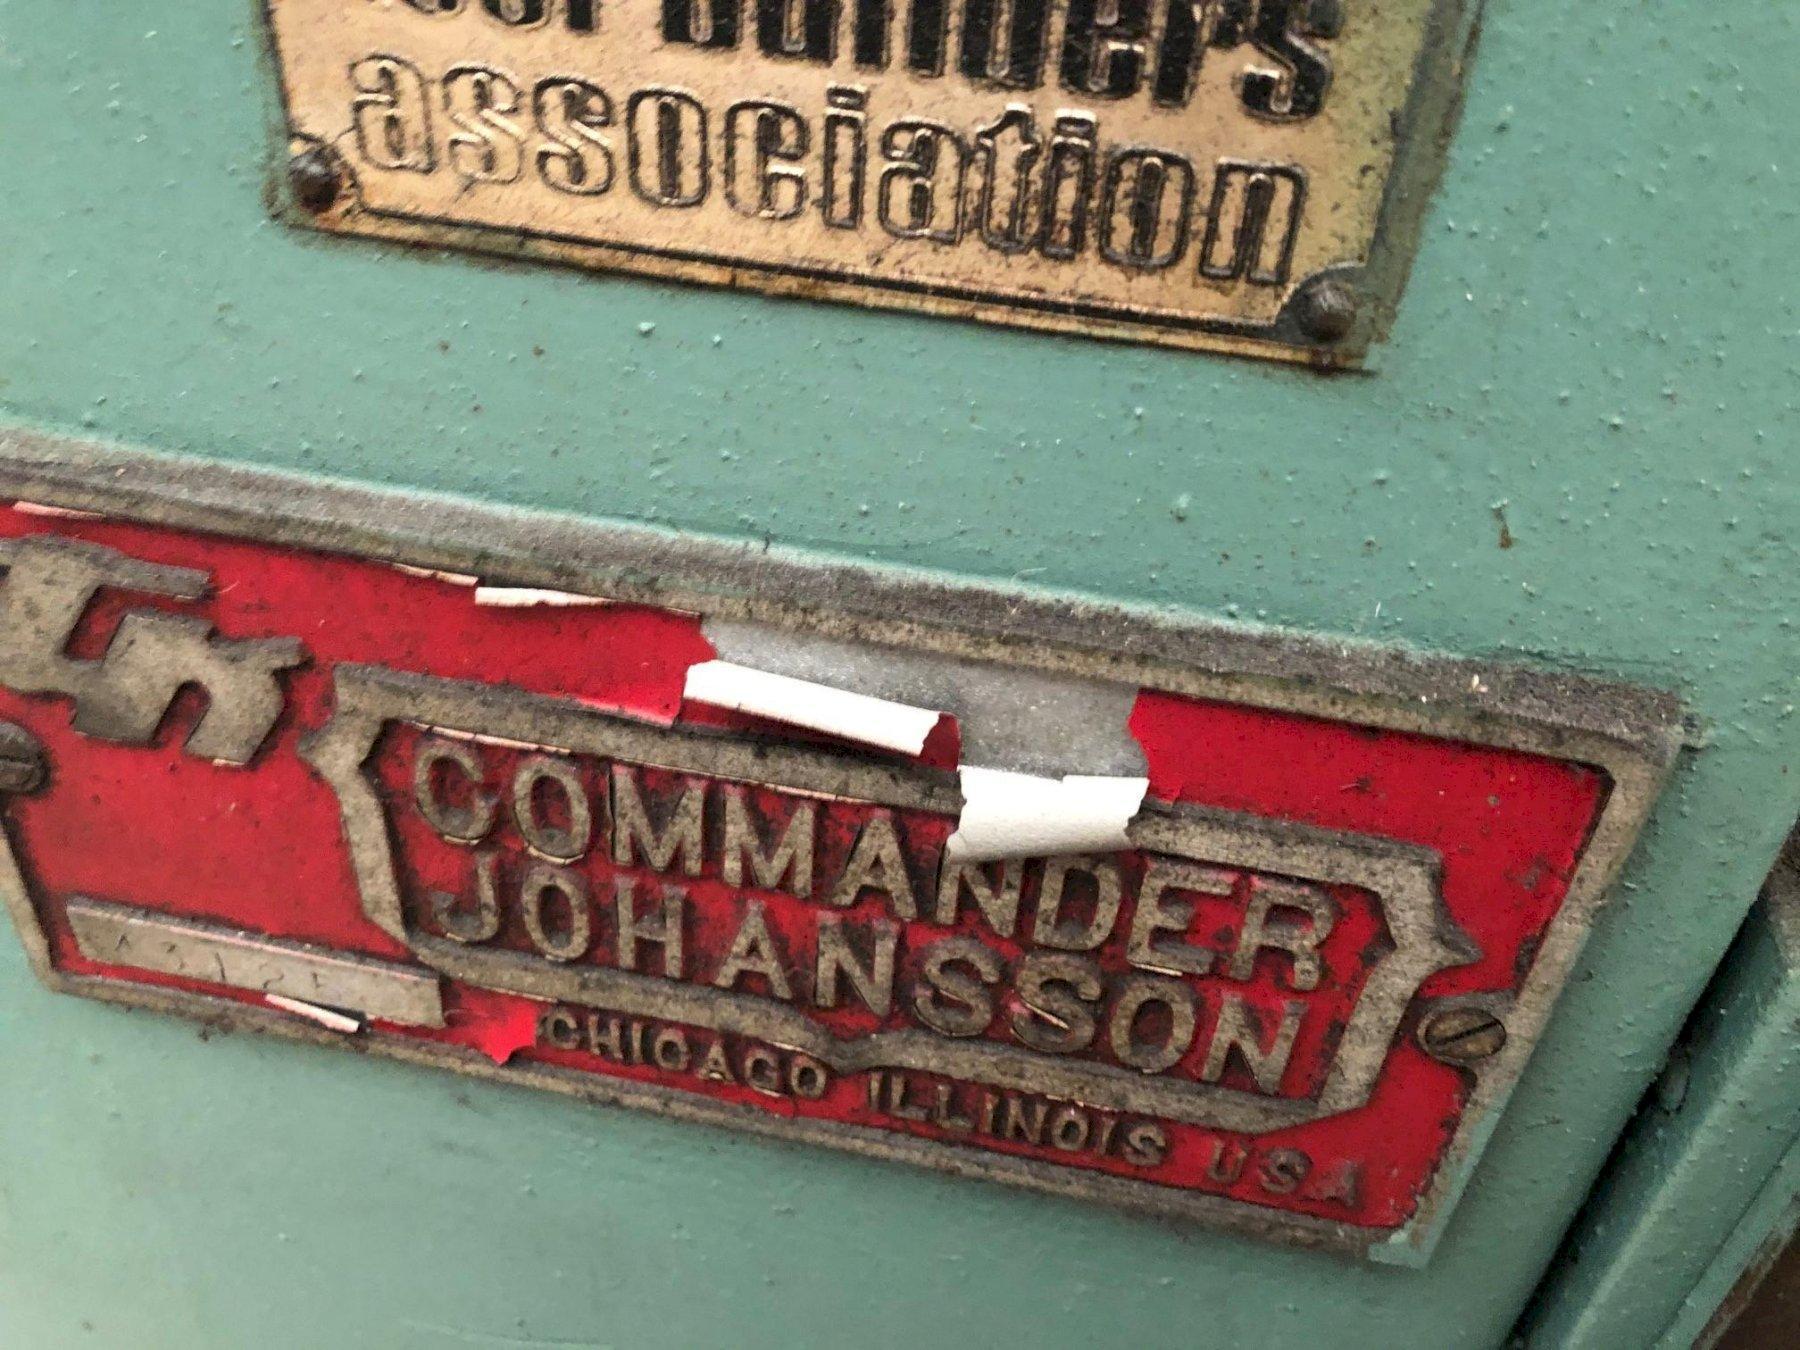 COMMANDER JOHANSSON DRILL PRESS